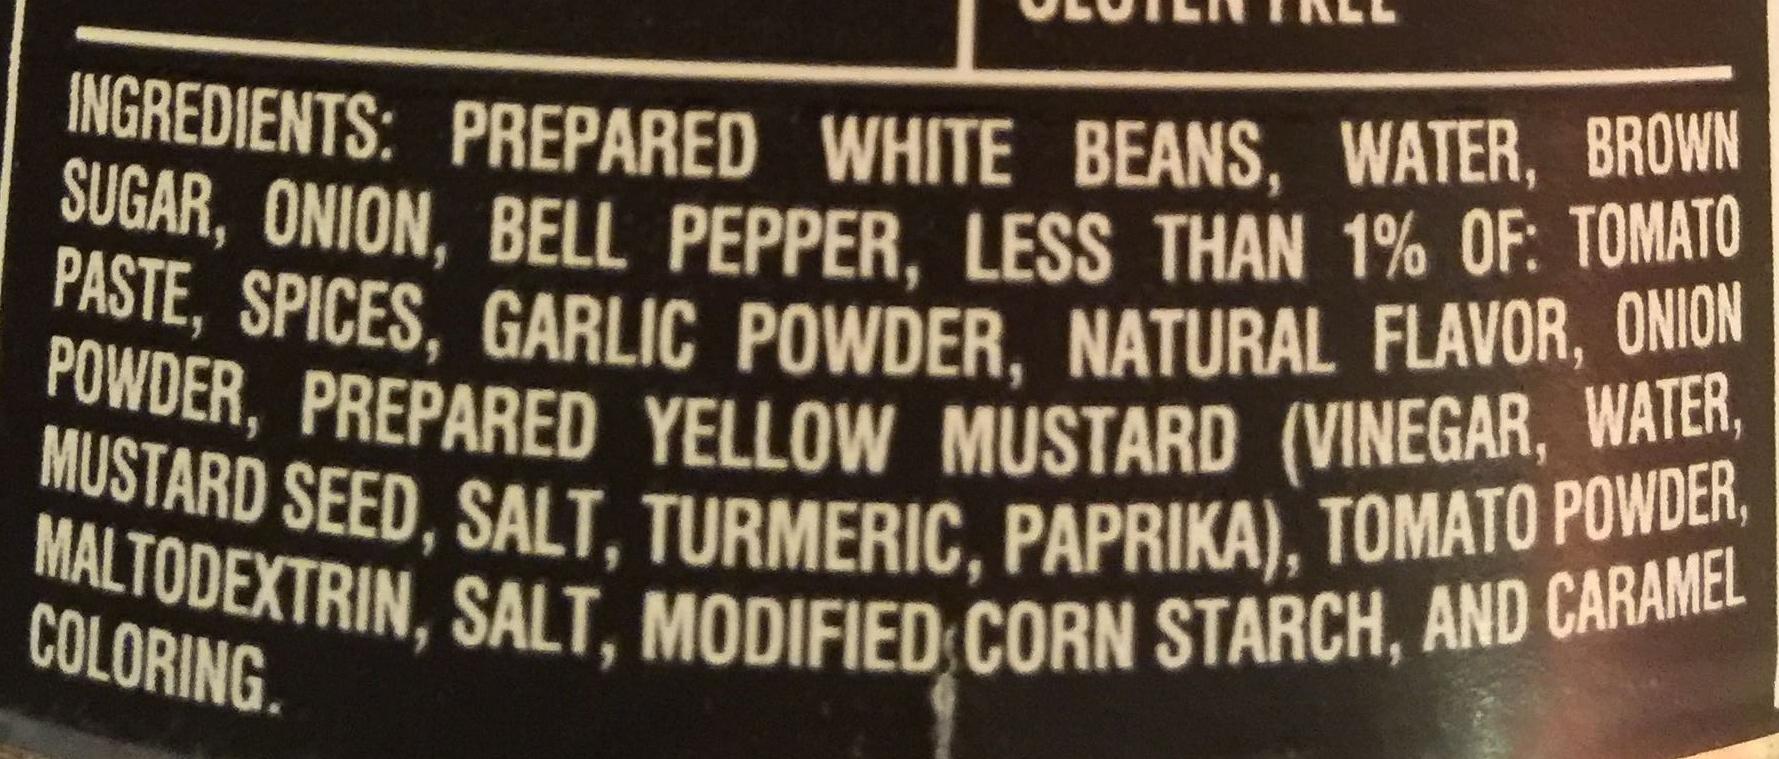 Steakhouse Recipe Grillin' Beans - Ingrediënten